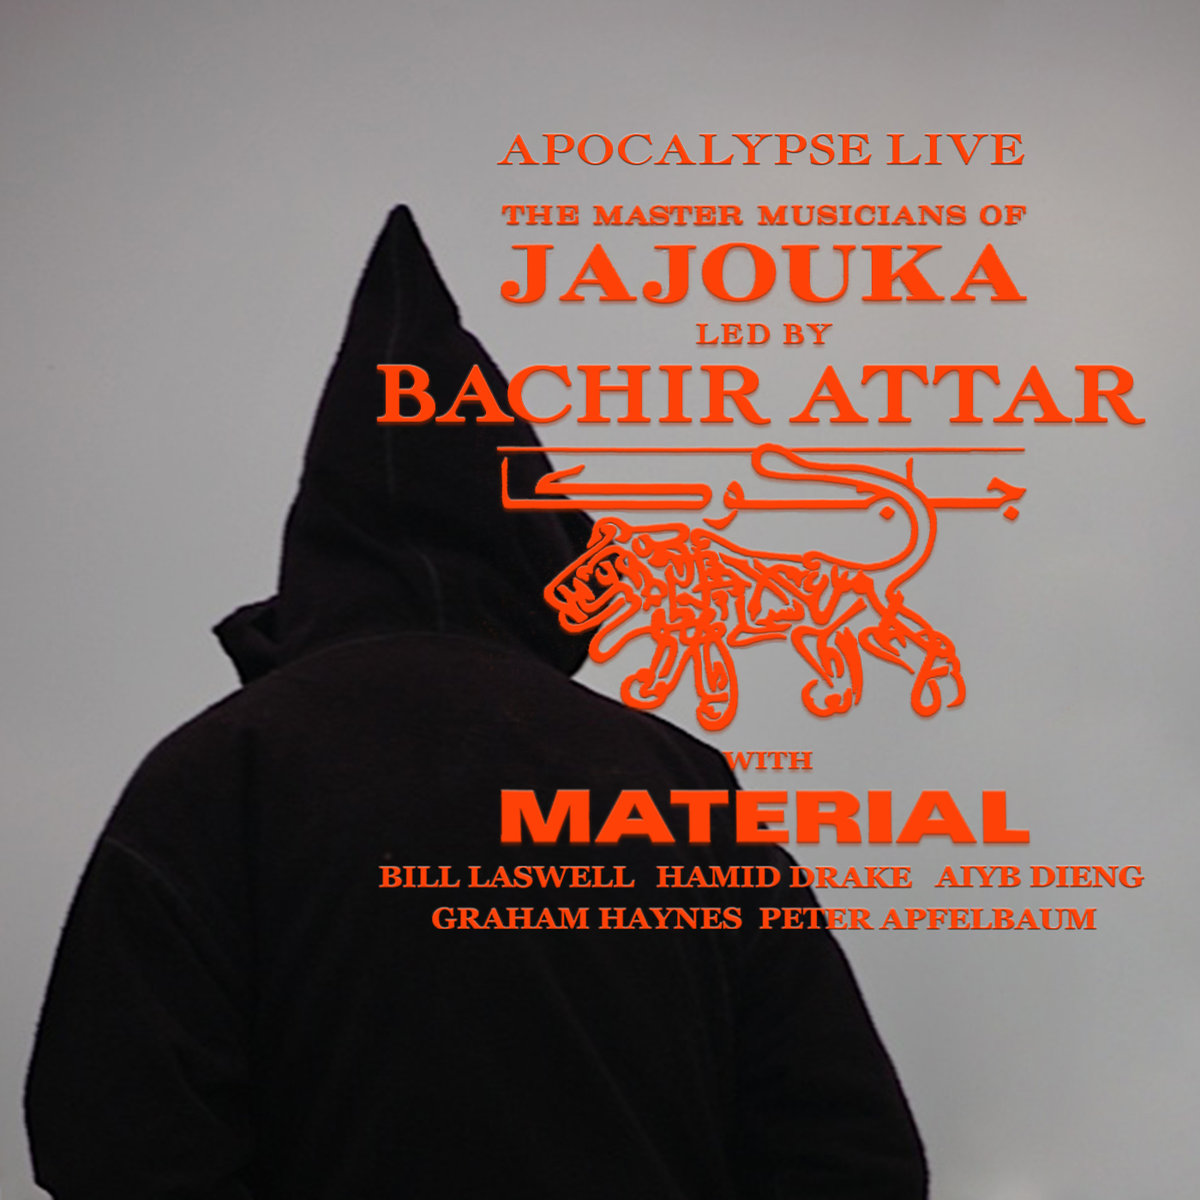 http://downbeat.com/images/reviews/Master_Musicians_of_Jajouka__Material_Apocalypse_Live.jpg